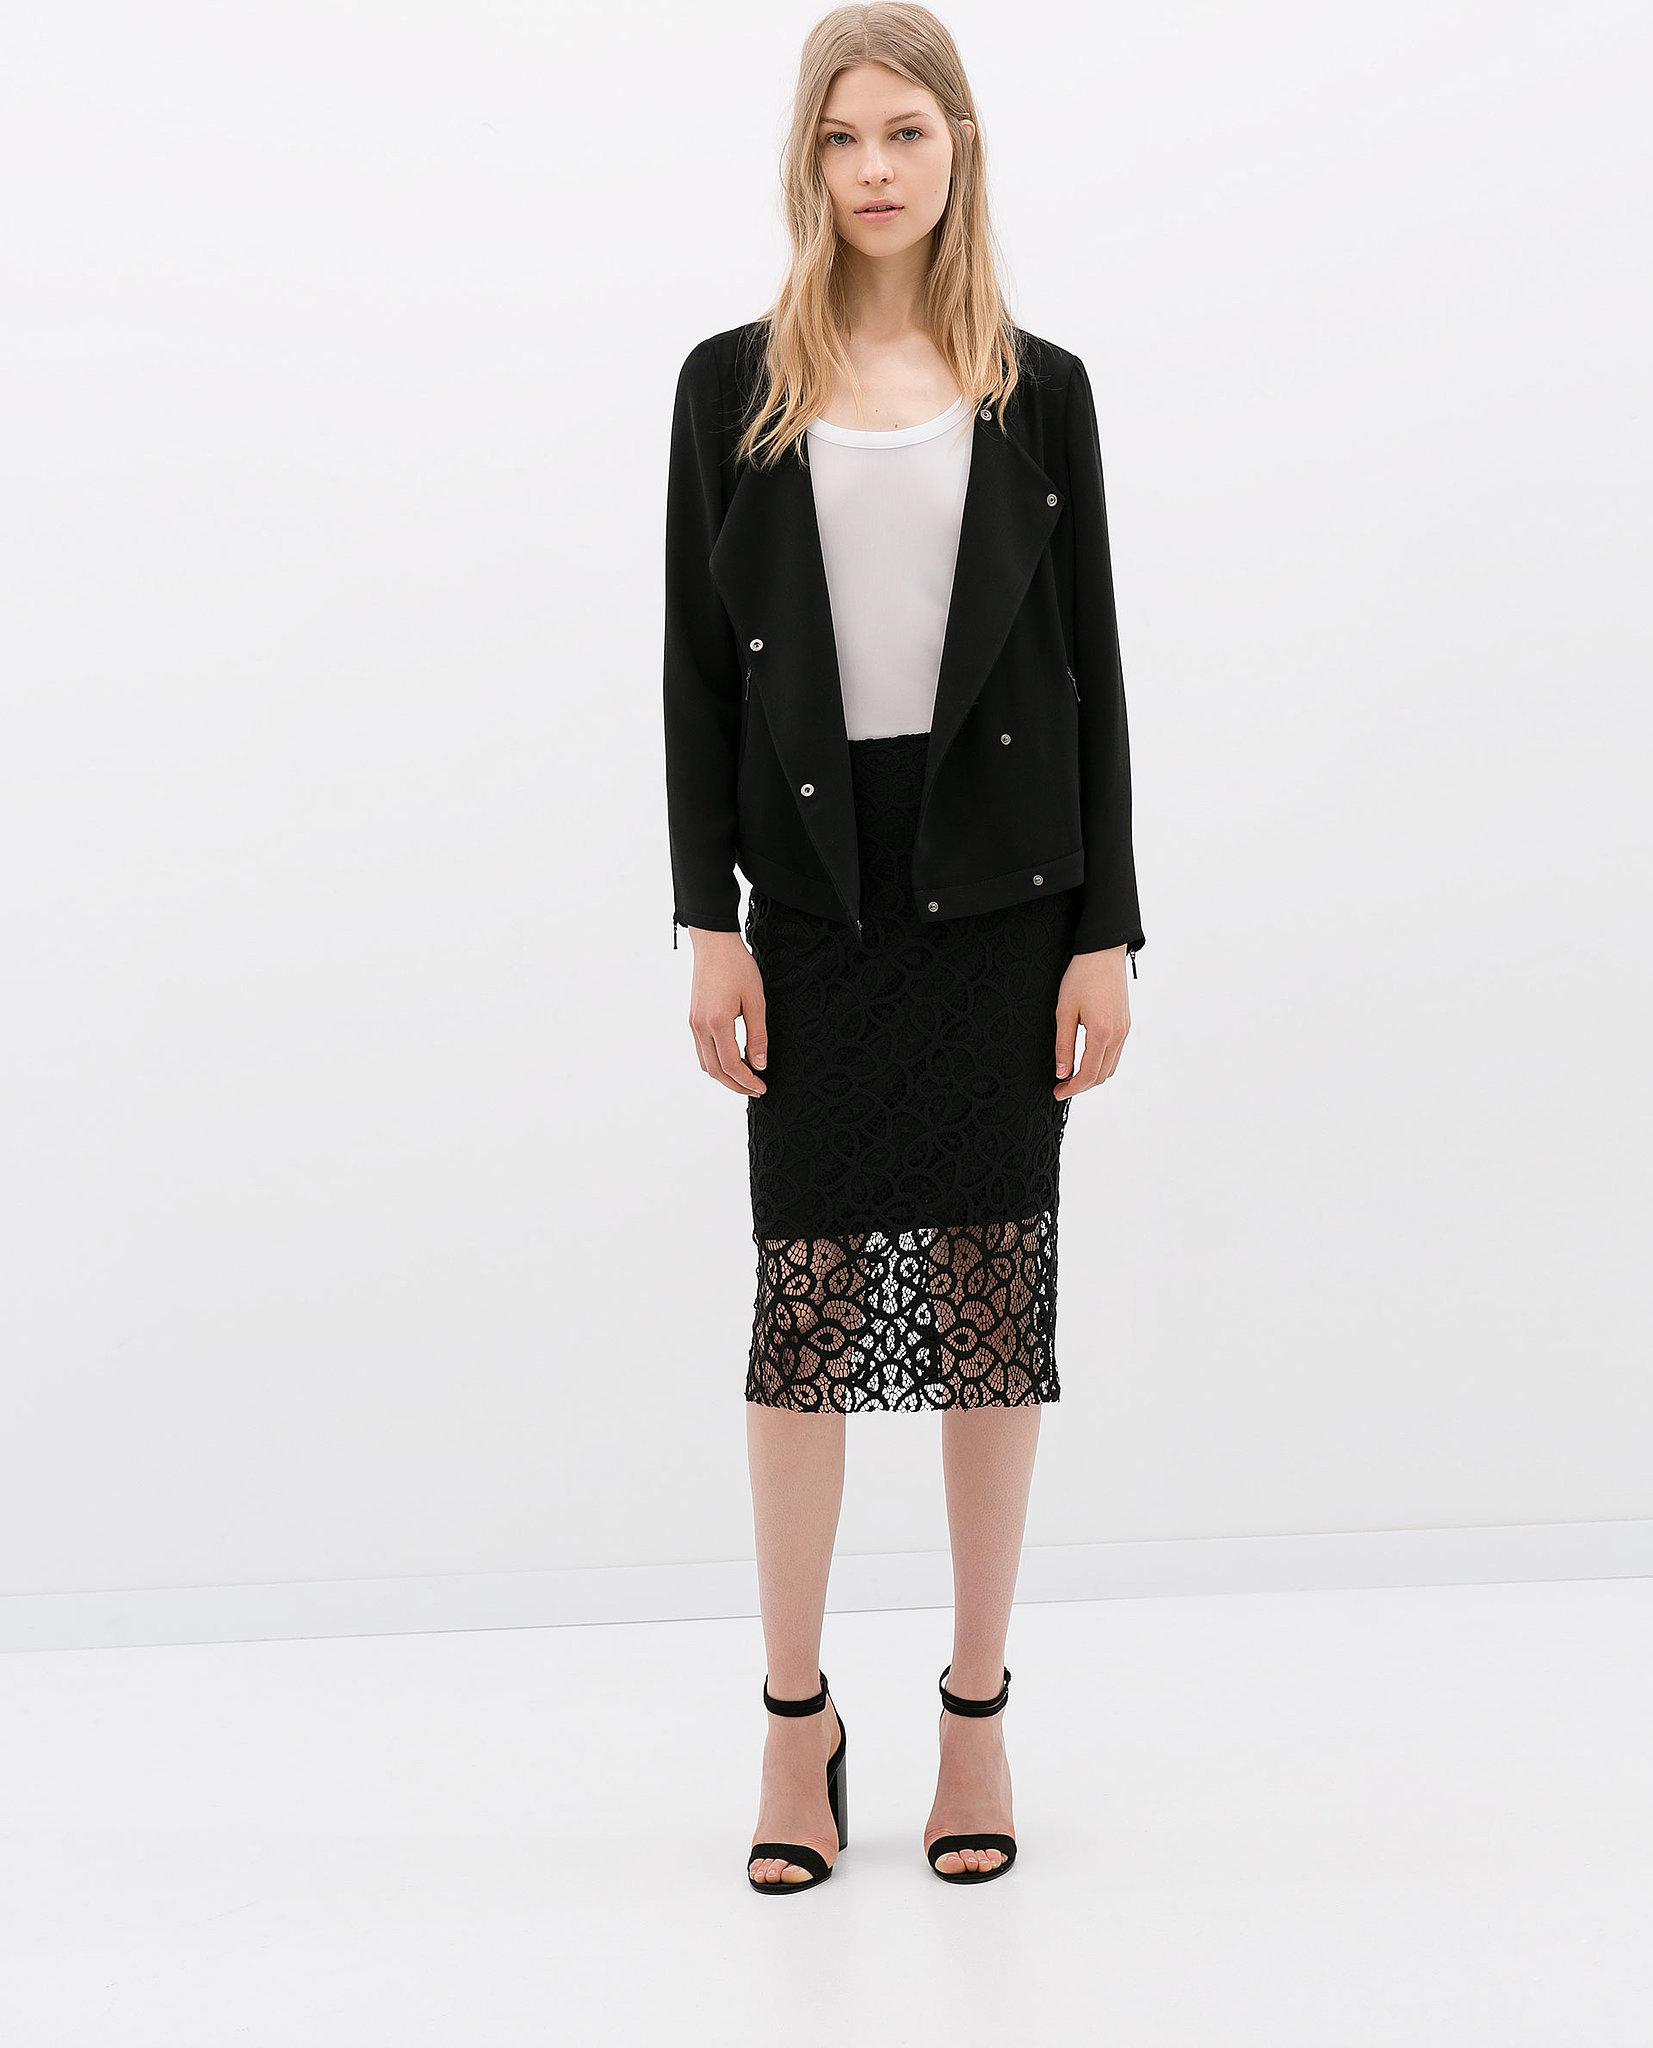 Zara Lace Pencil Skirt